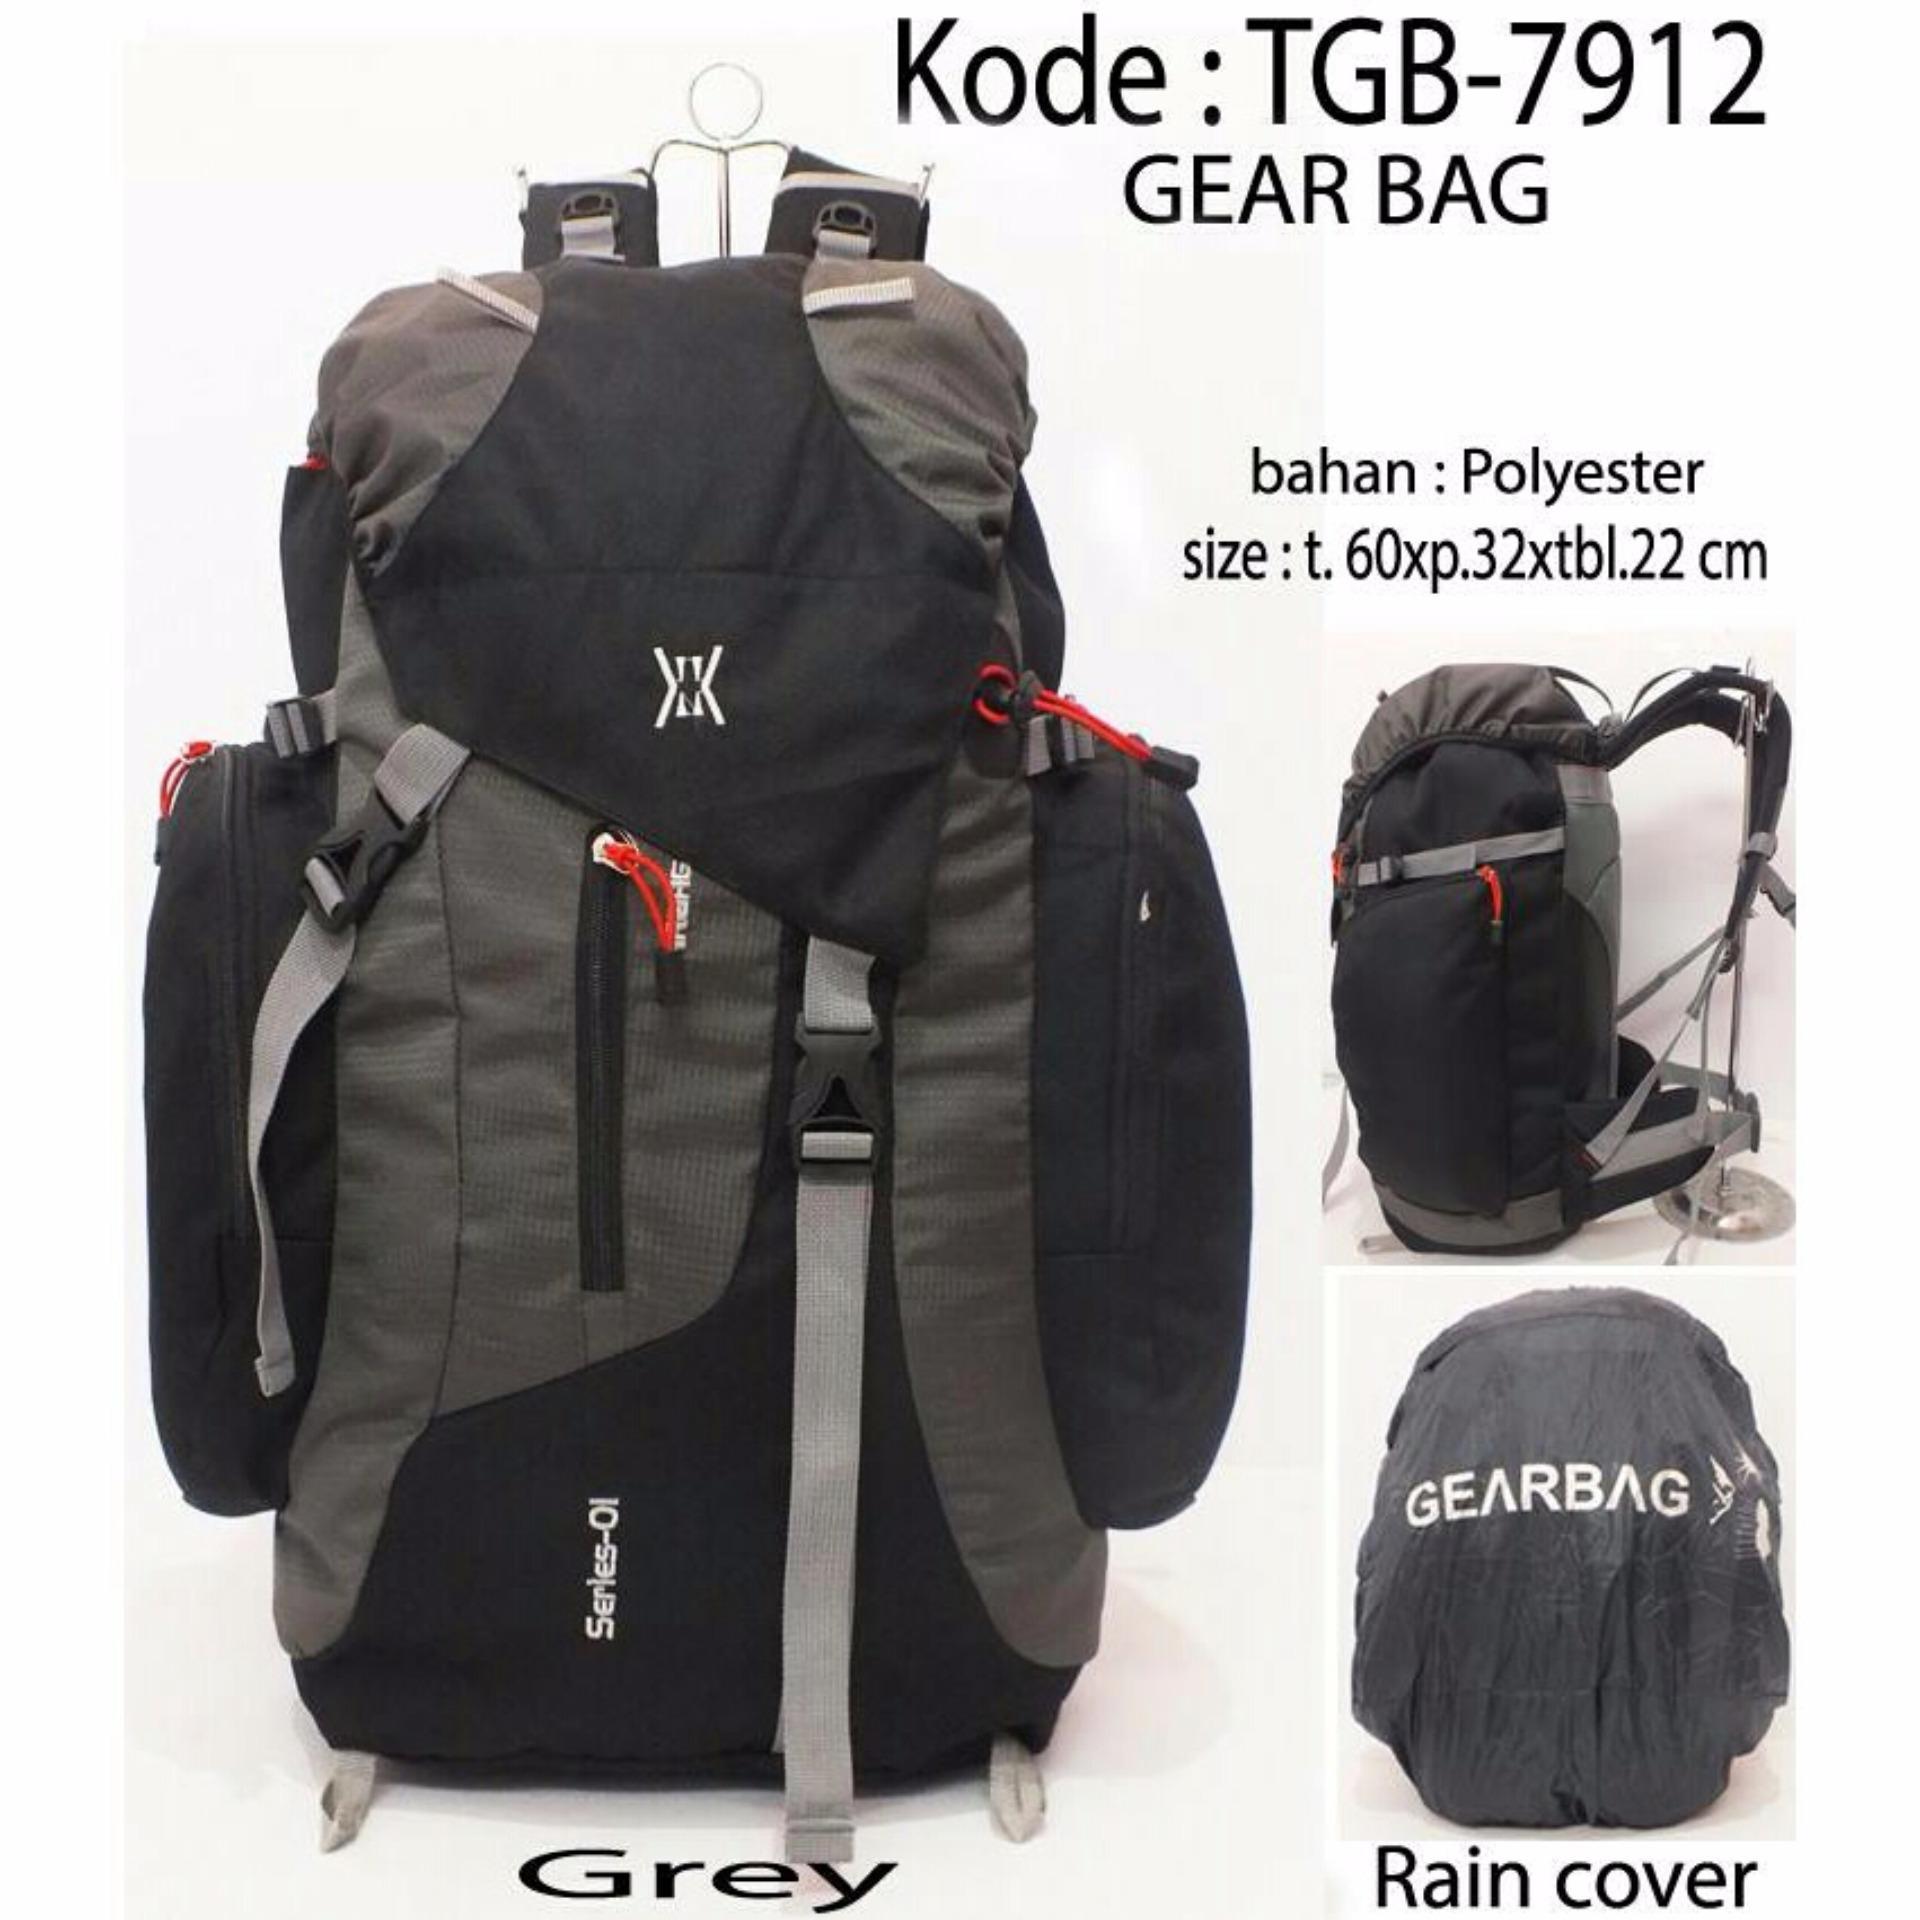 Gear Bag Tas Ransel Traveller and Camping 85 Liter - Original